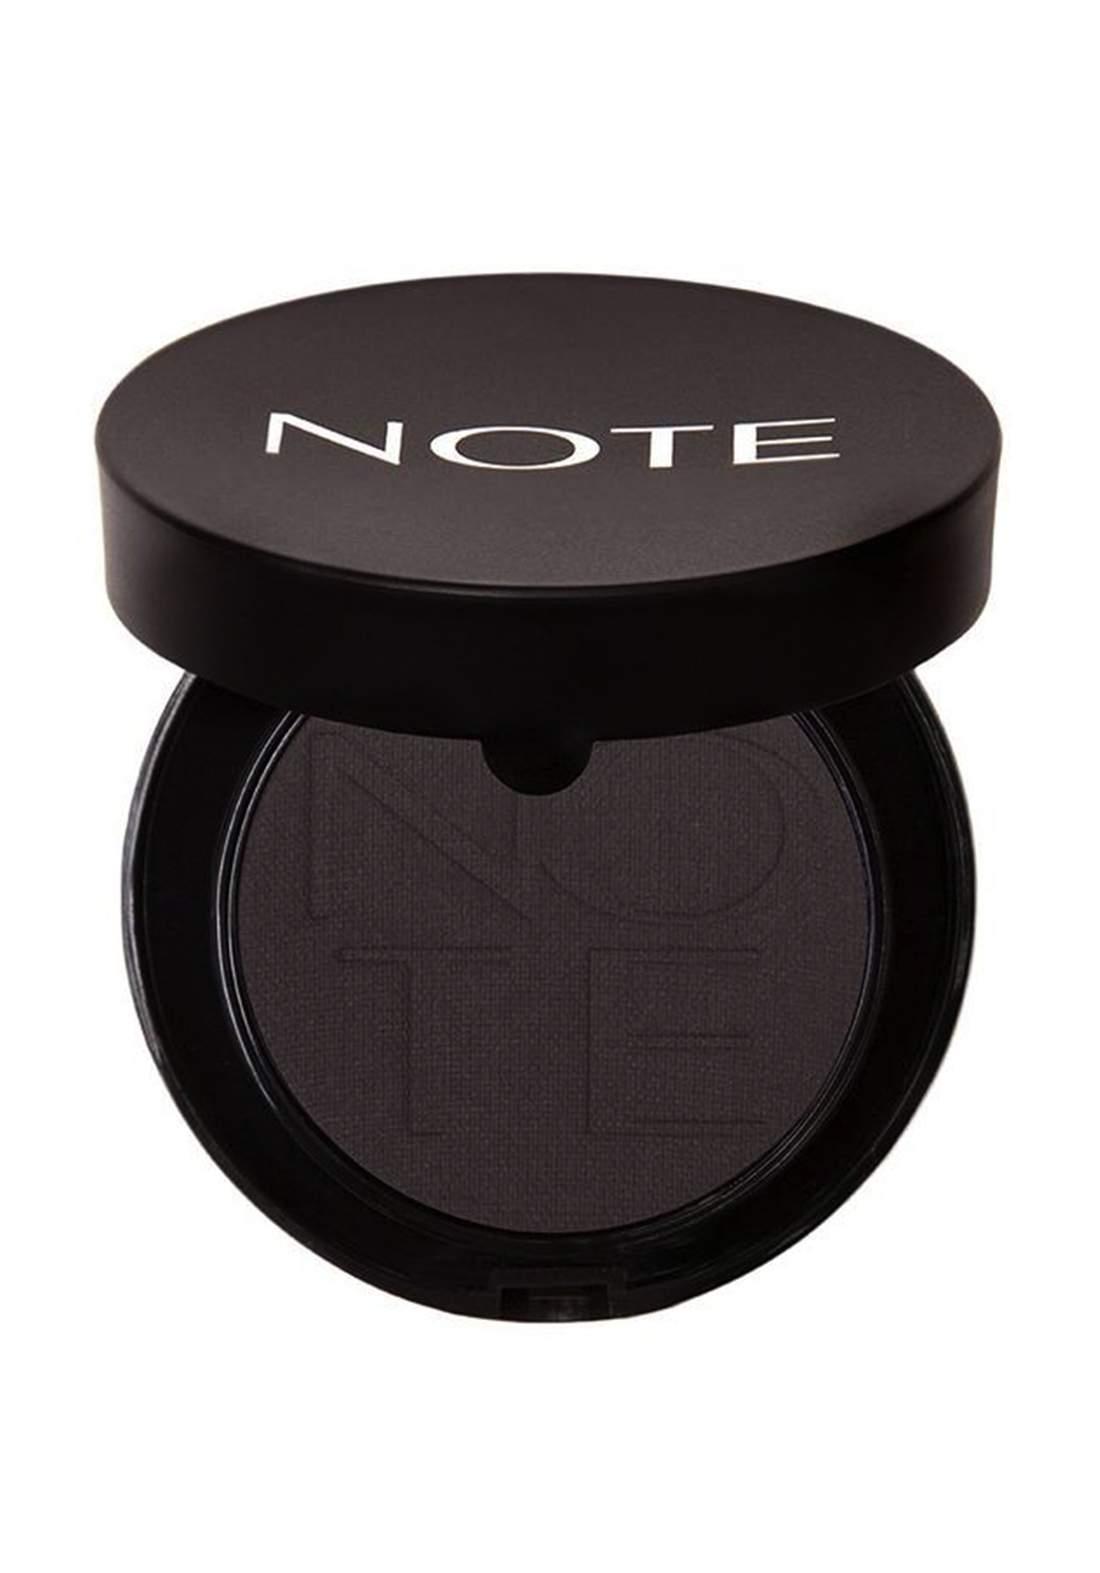 Note Luminous Silk Mono Eyeshadow No.12 ظلال للعيون